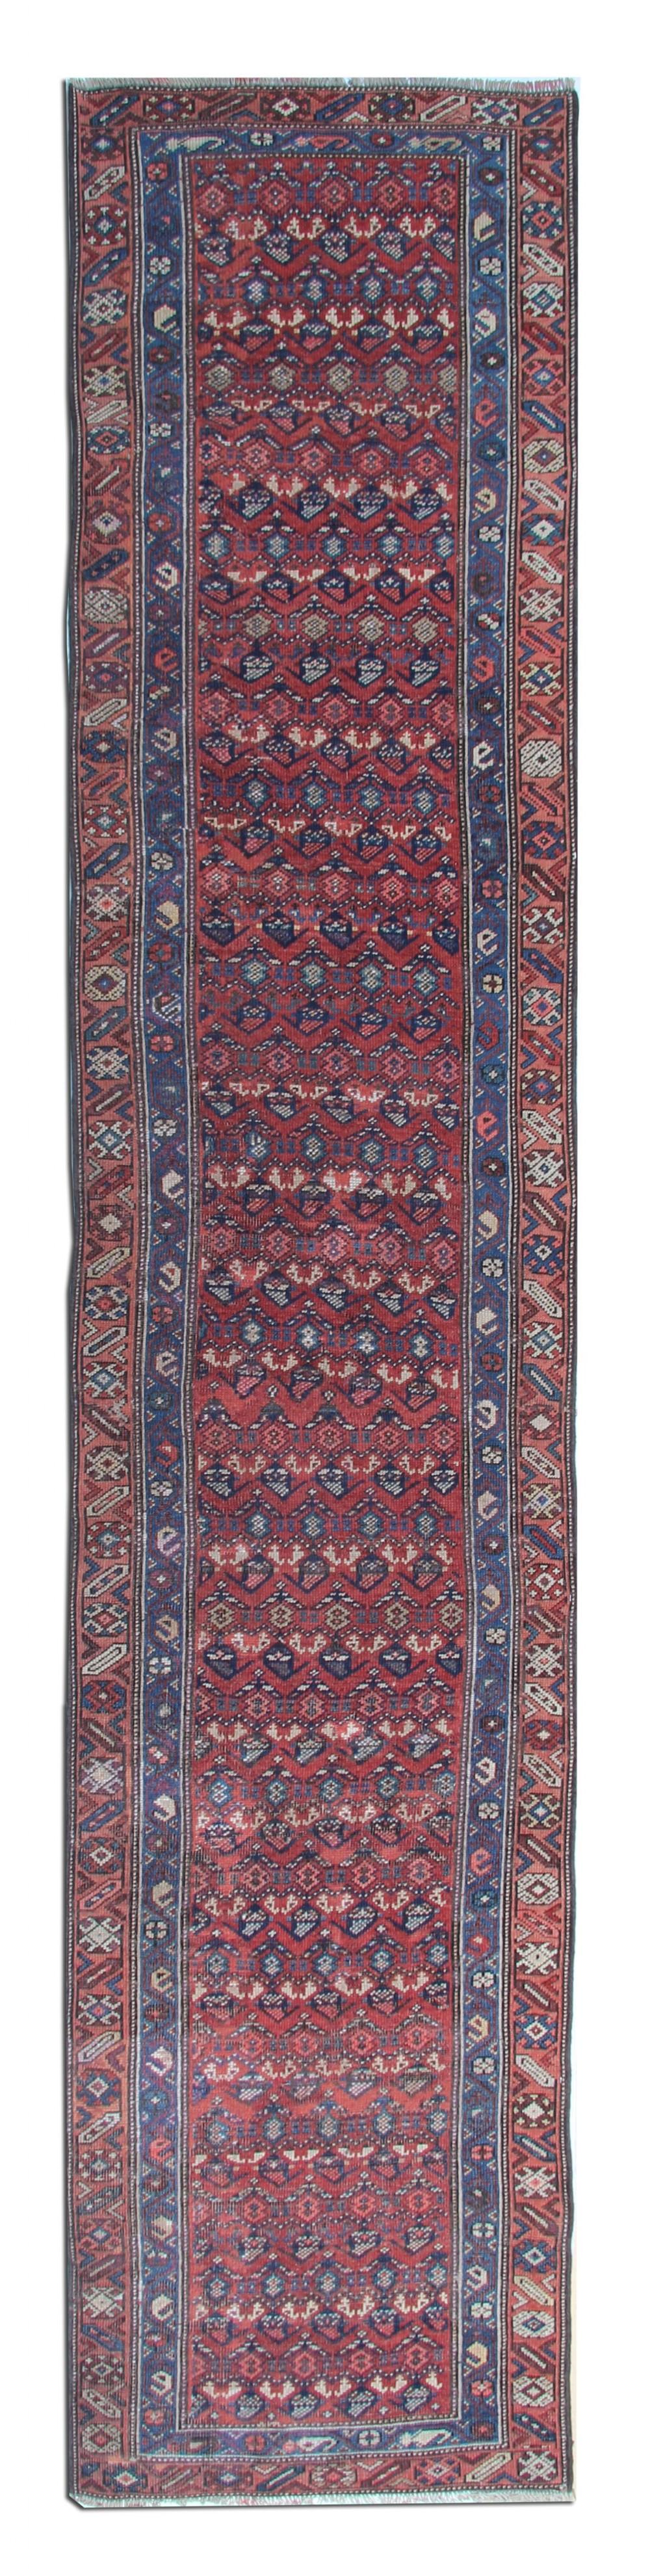 long handmade antique persian malayer runner rug 82x410cm